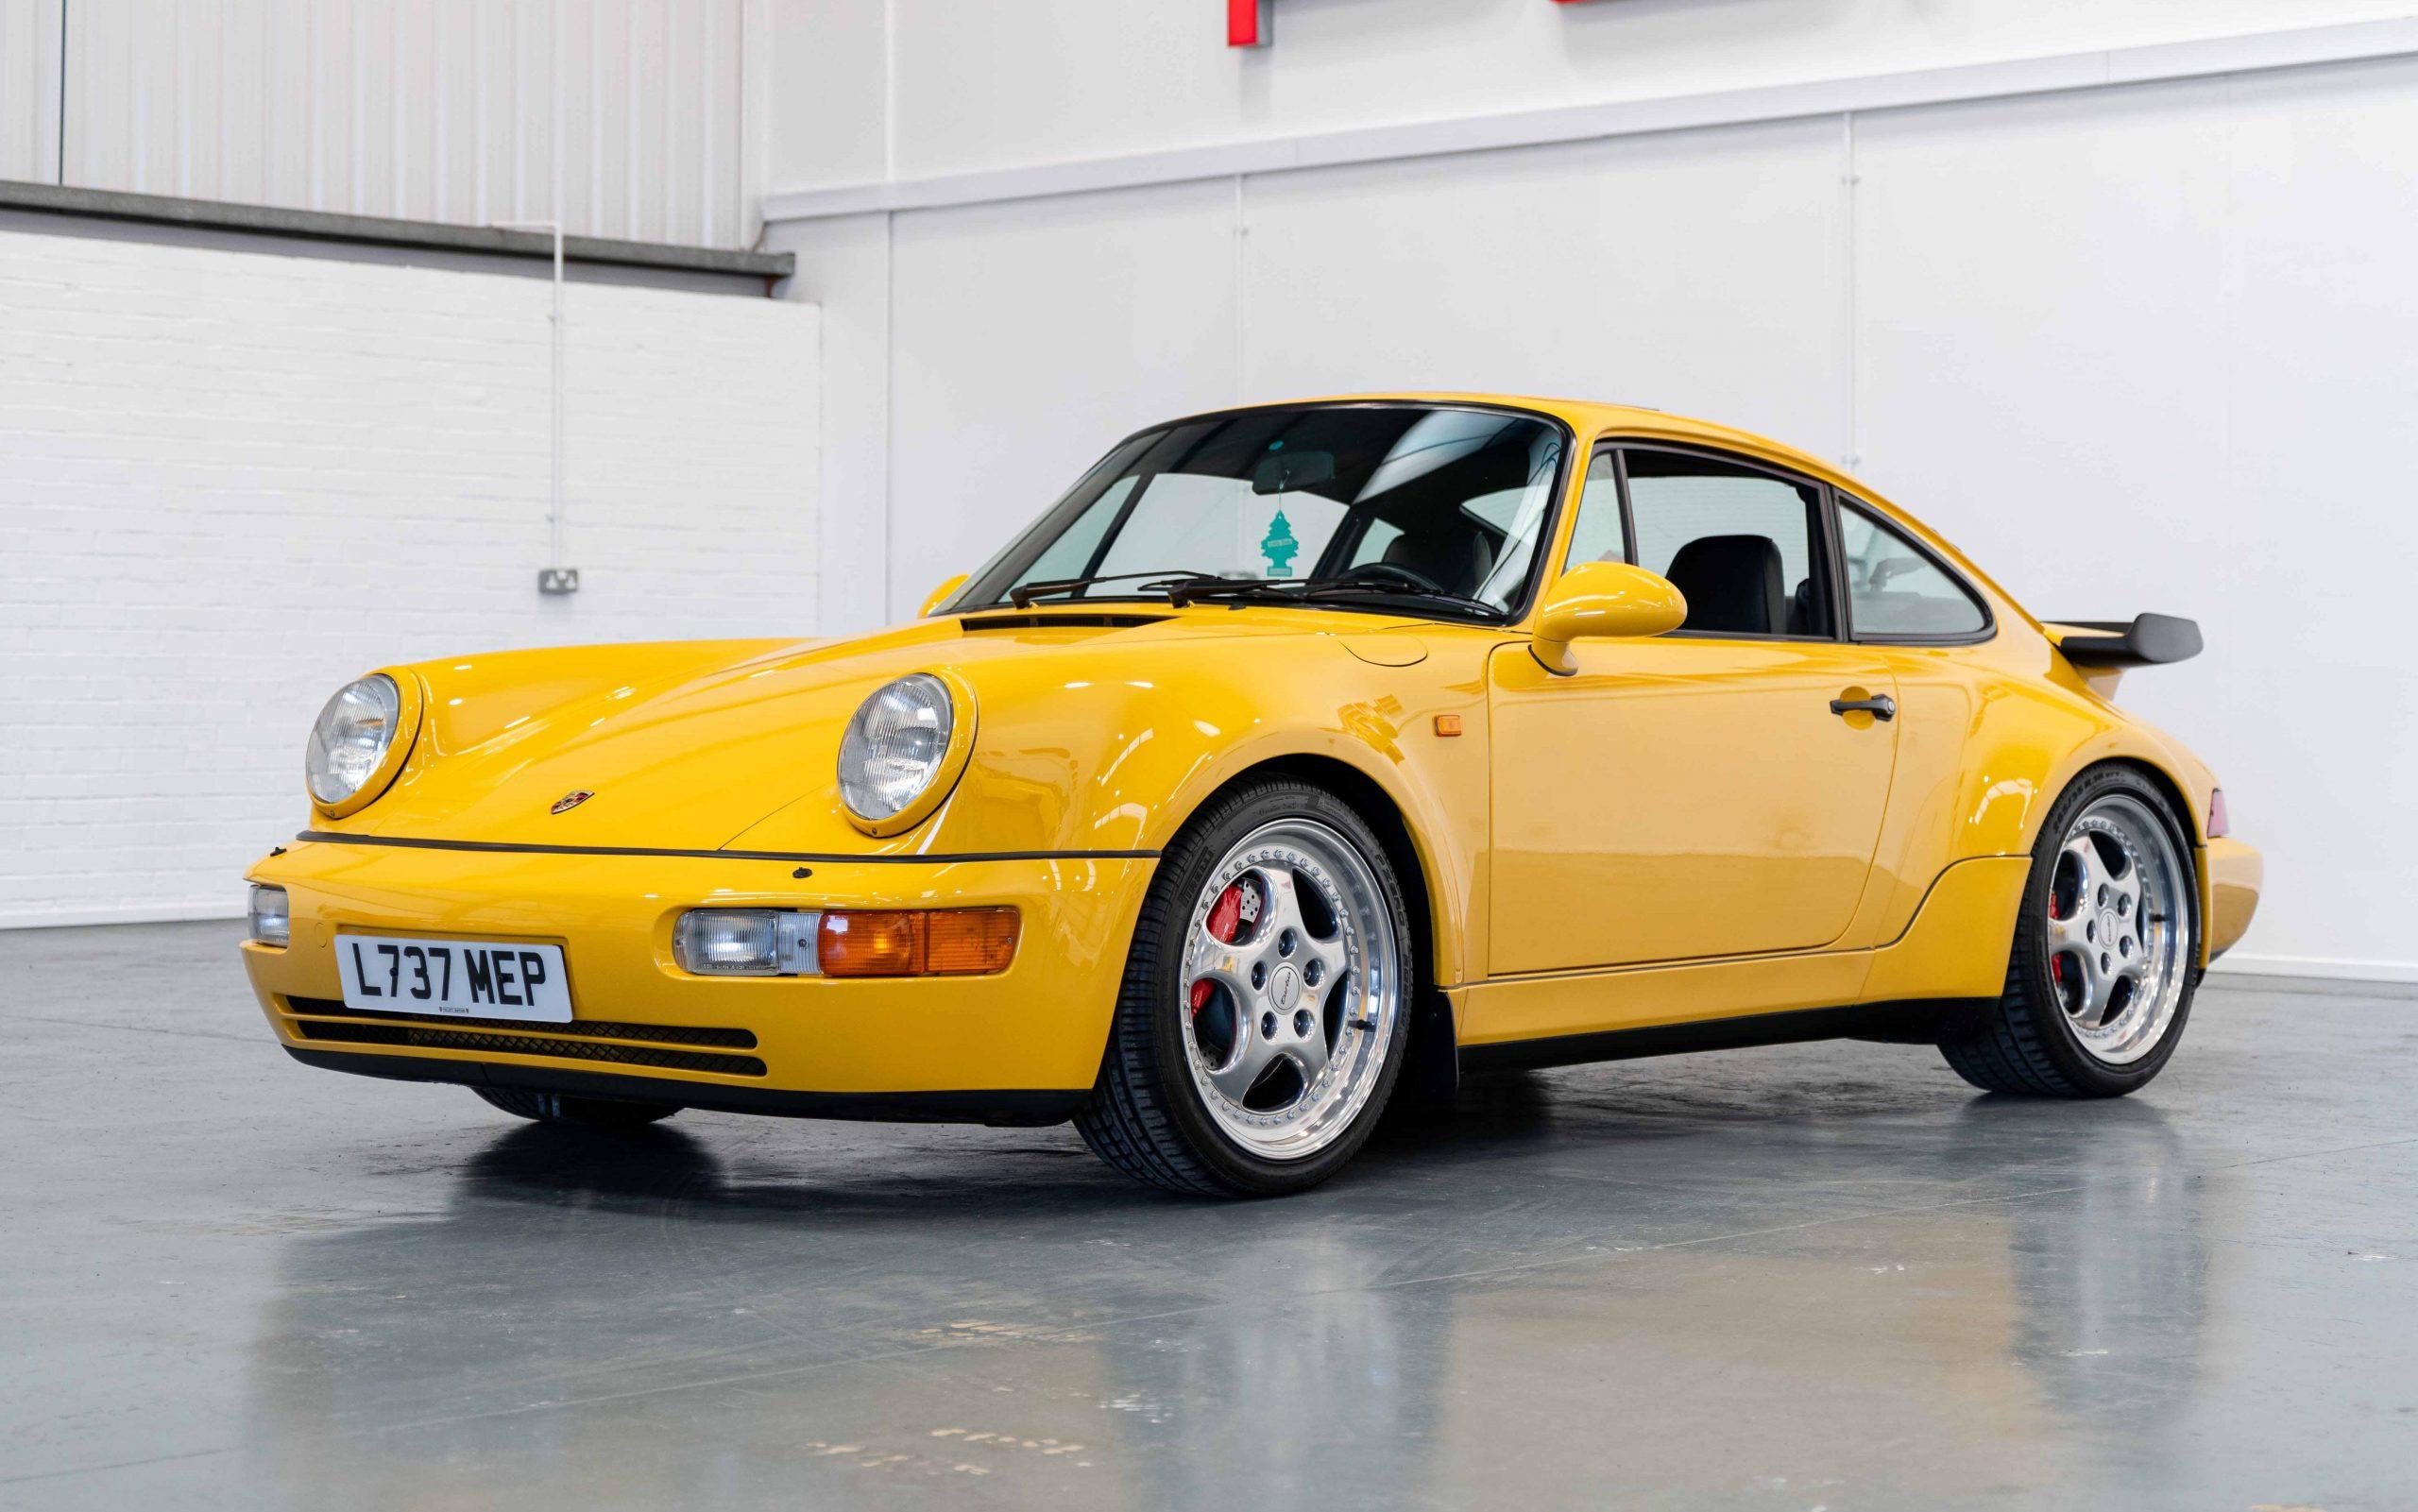 Leonard Collection Porsche 964 Turbo 3.6